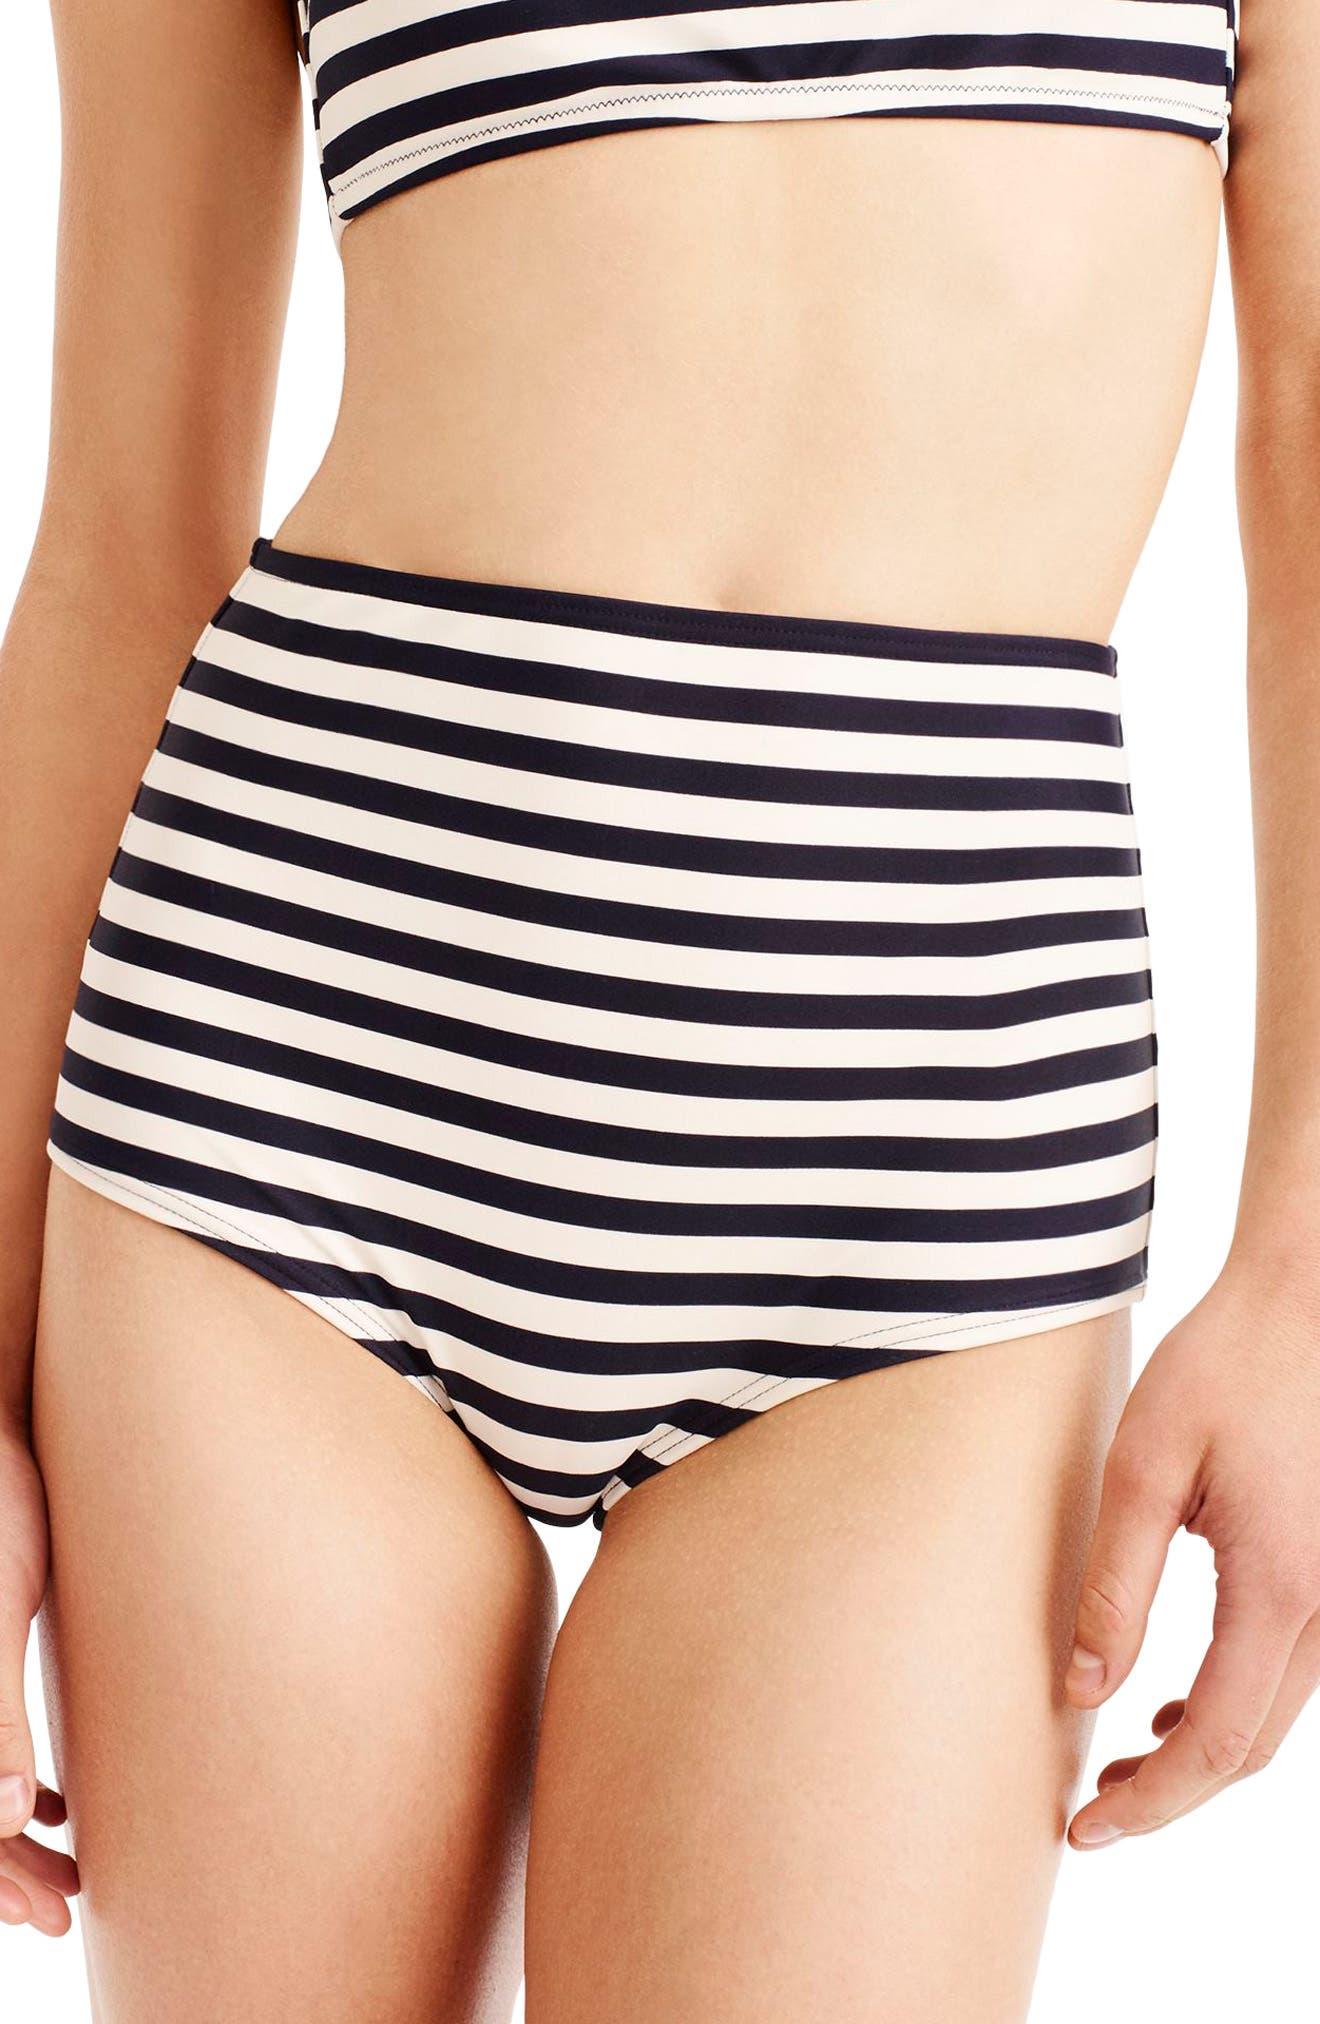 Stripe High Waist Bikini Bottoms,                         Main,                         color, NAVY IVORY